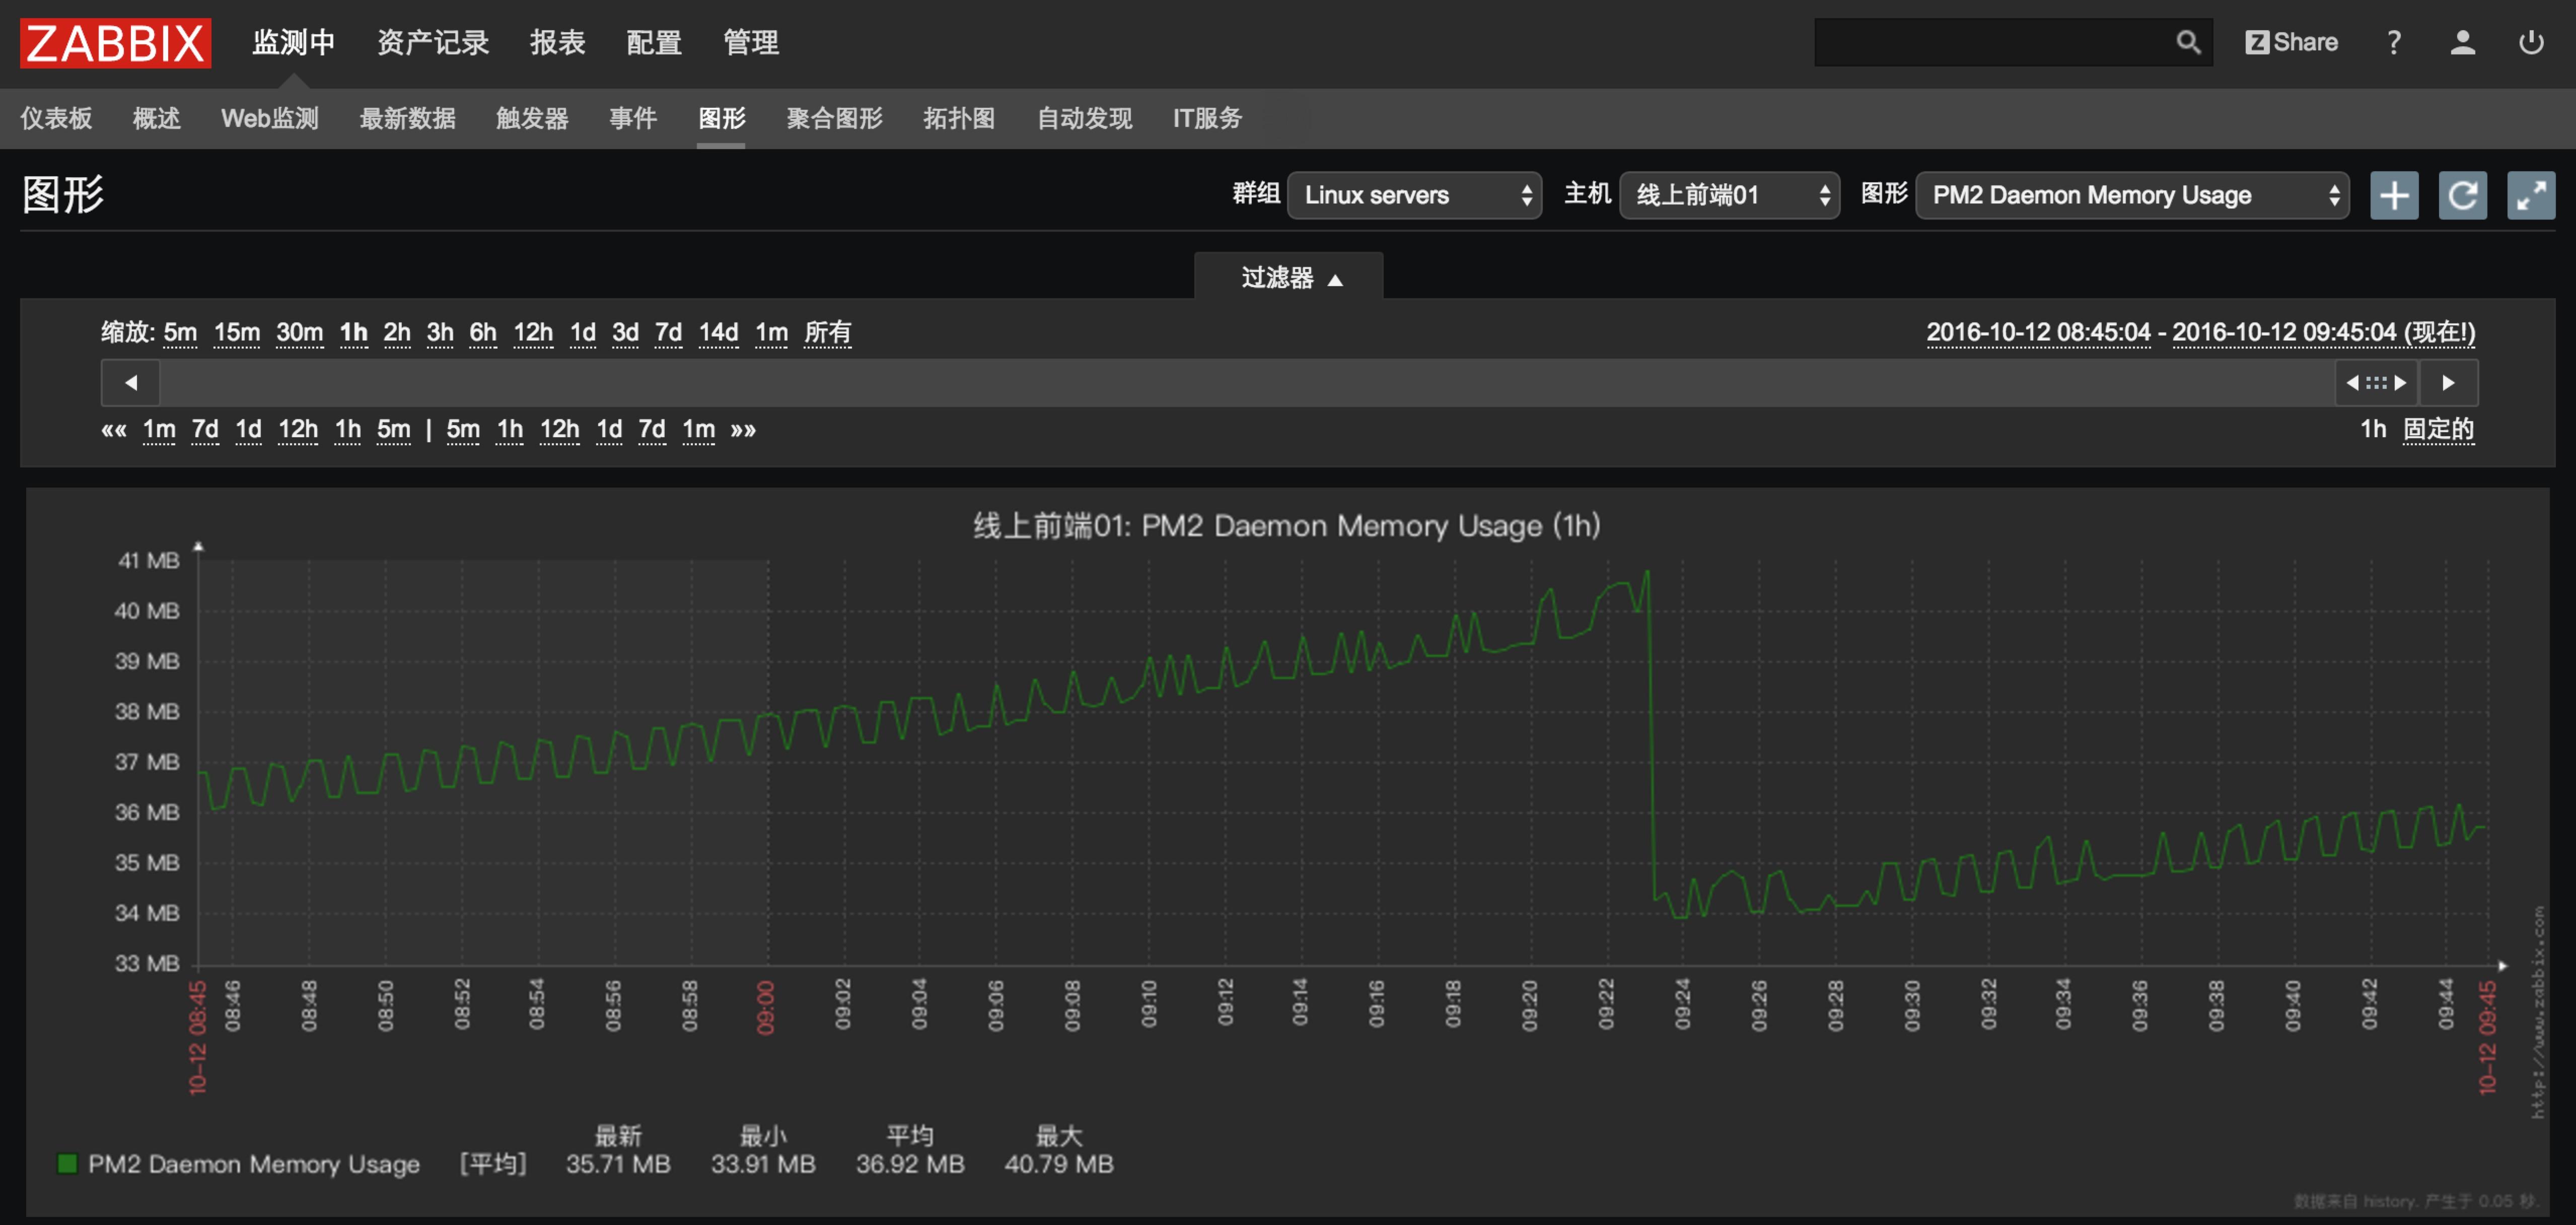 PM2 Daemon Memory Usage